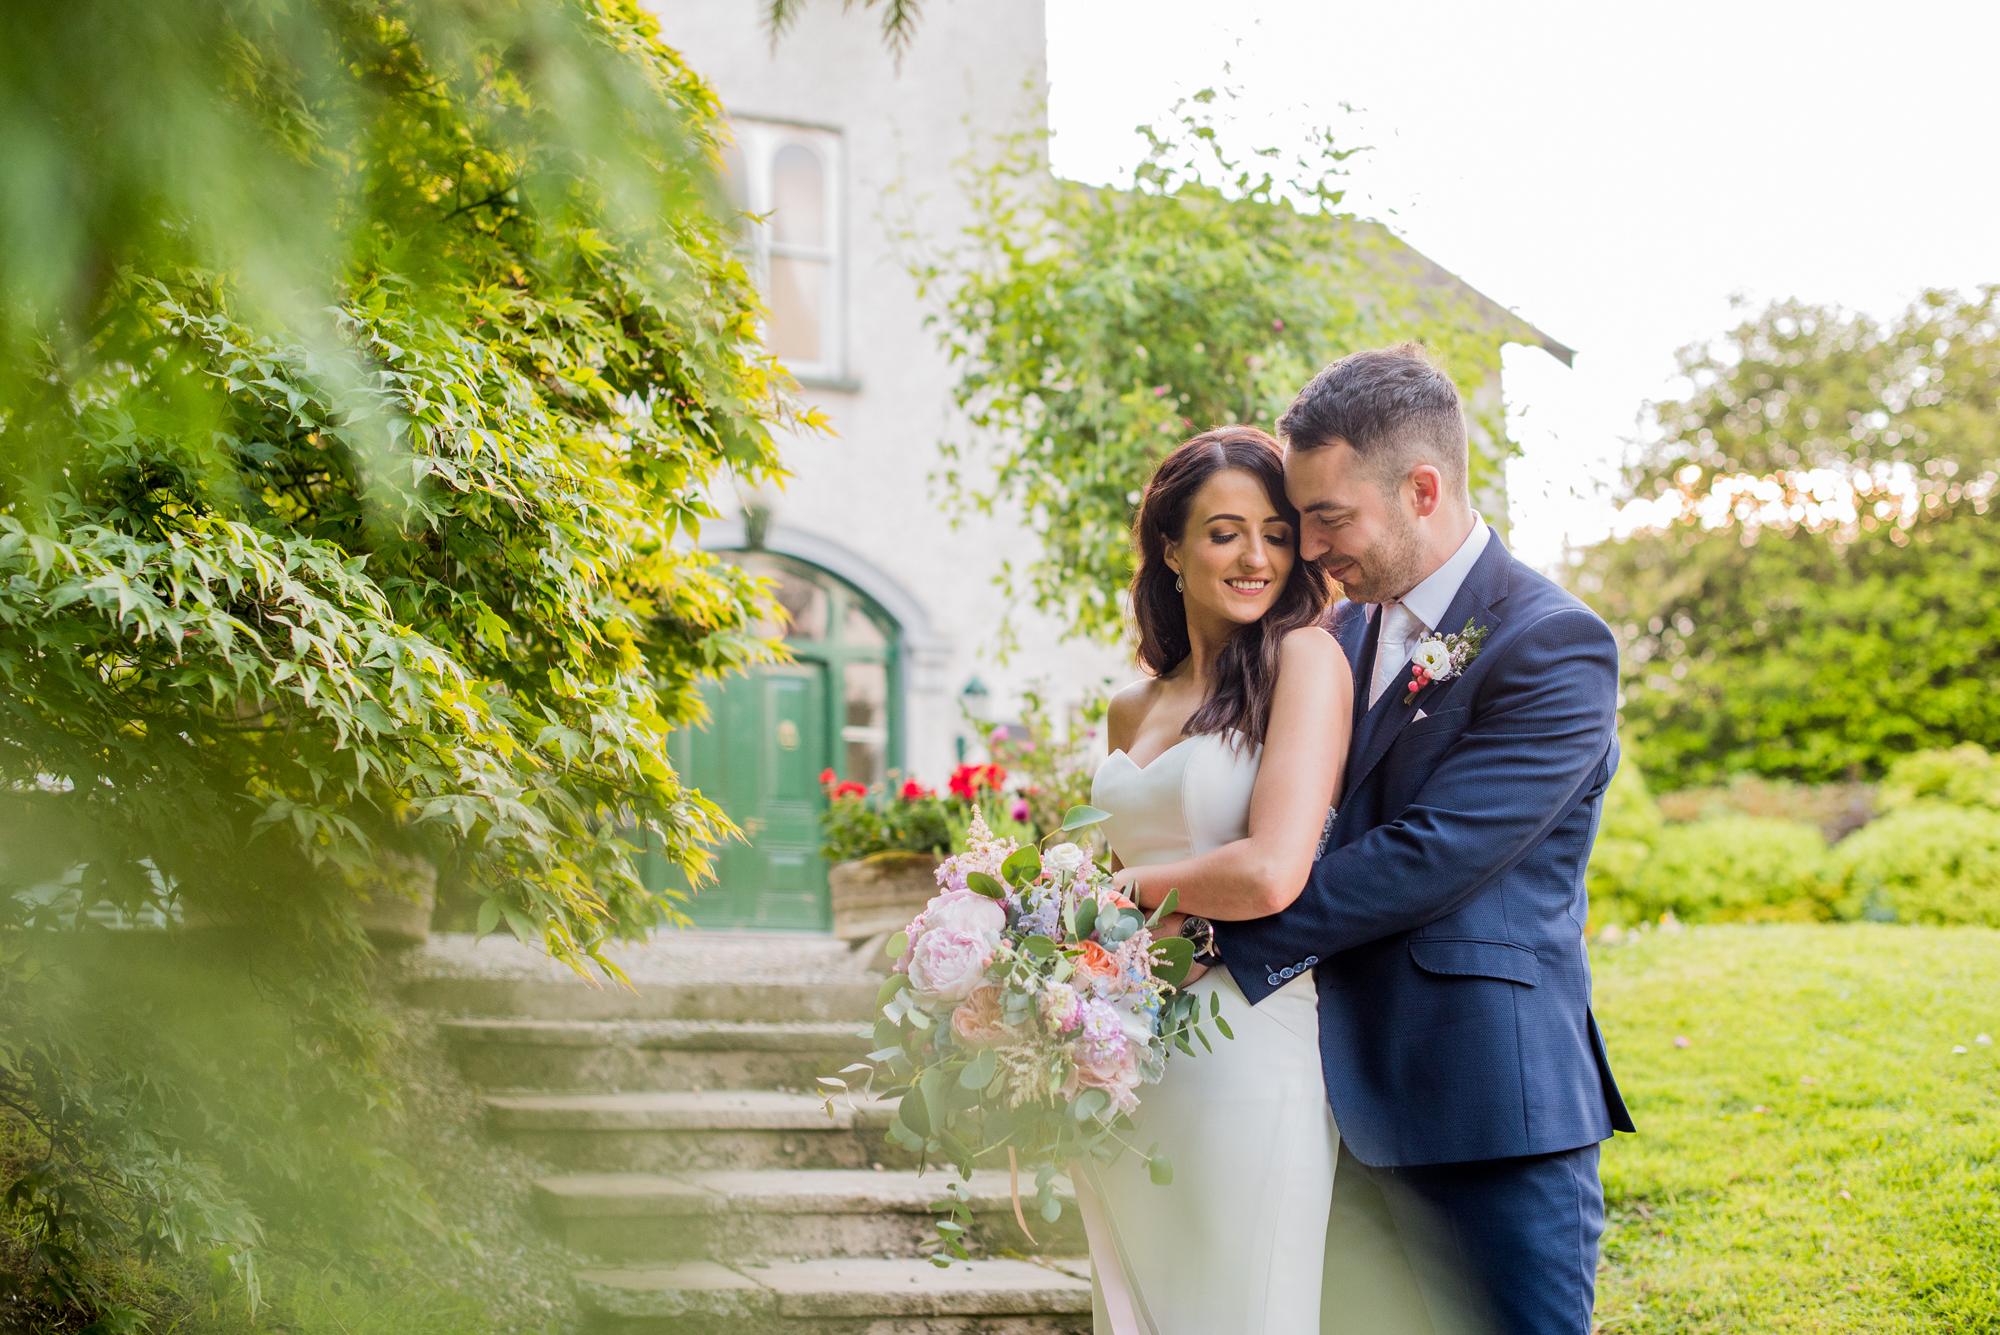 mark_barton_Wedding_photographer_northern_ireland_15.jpg